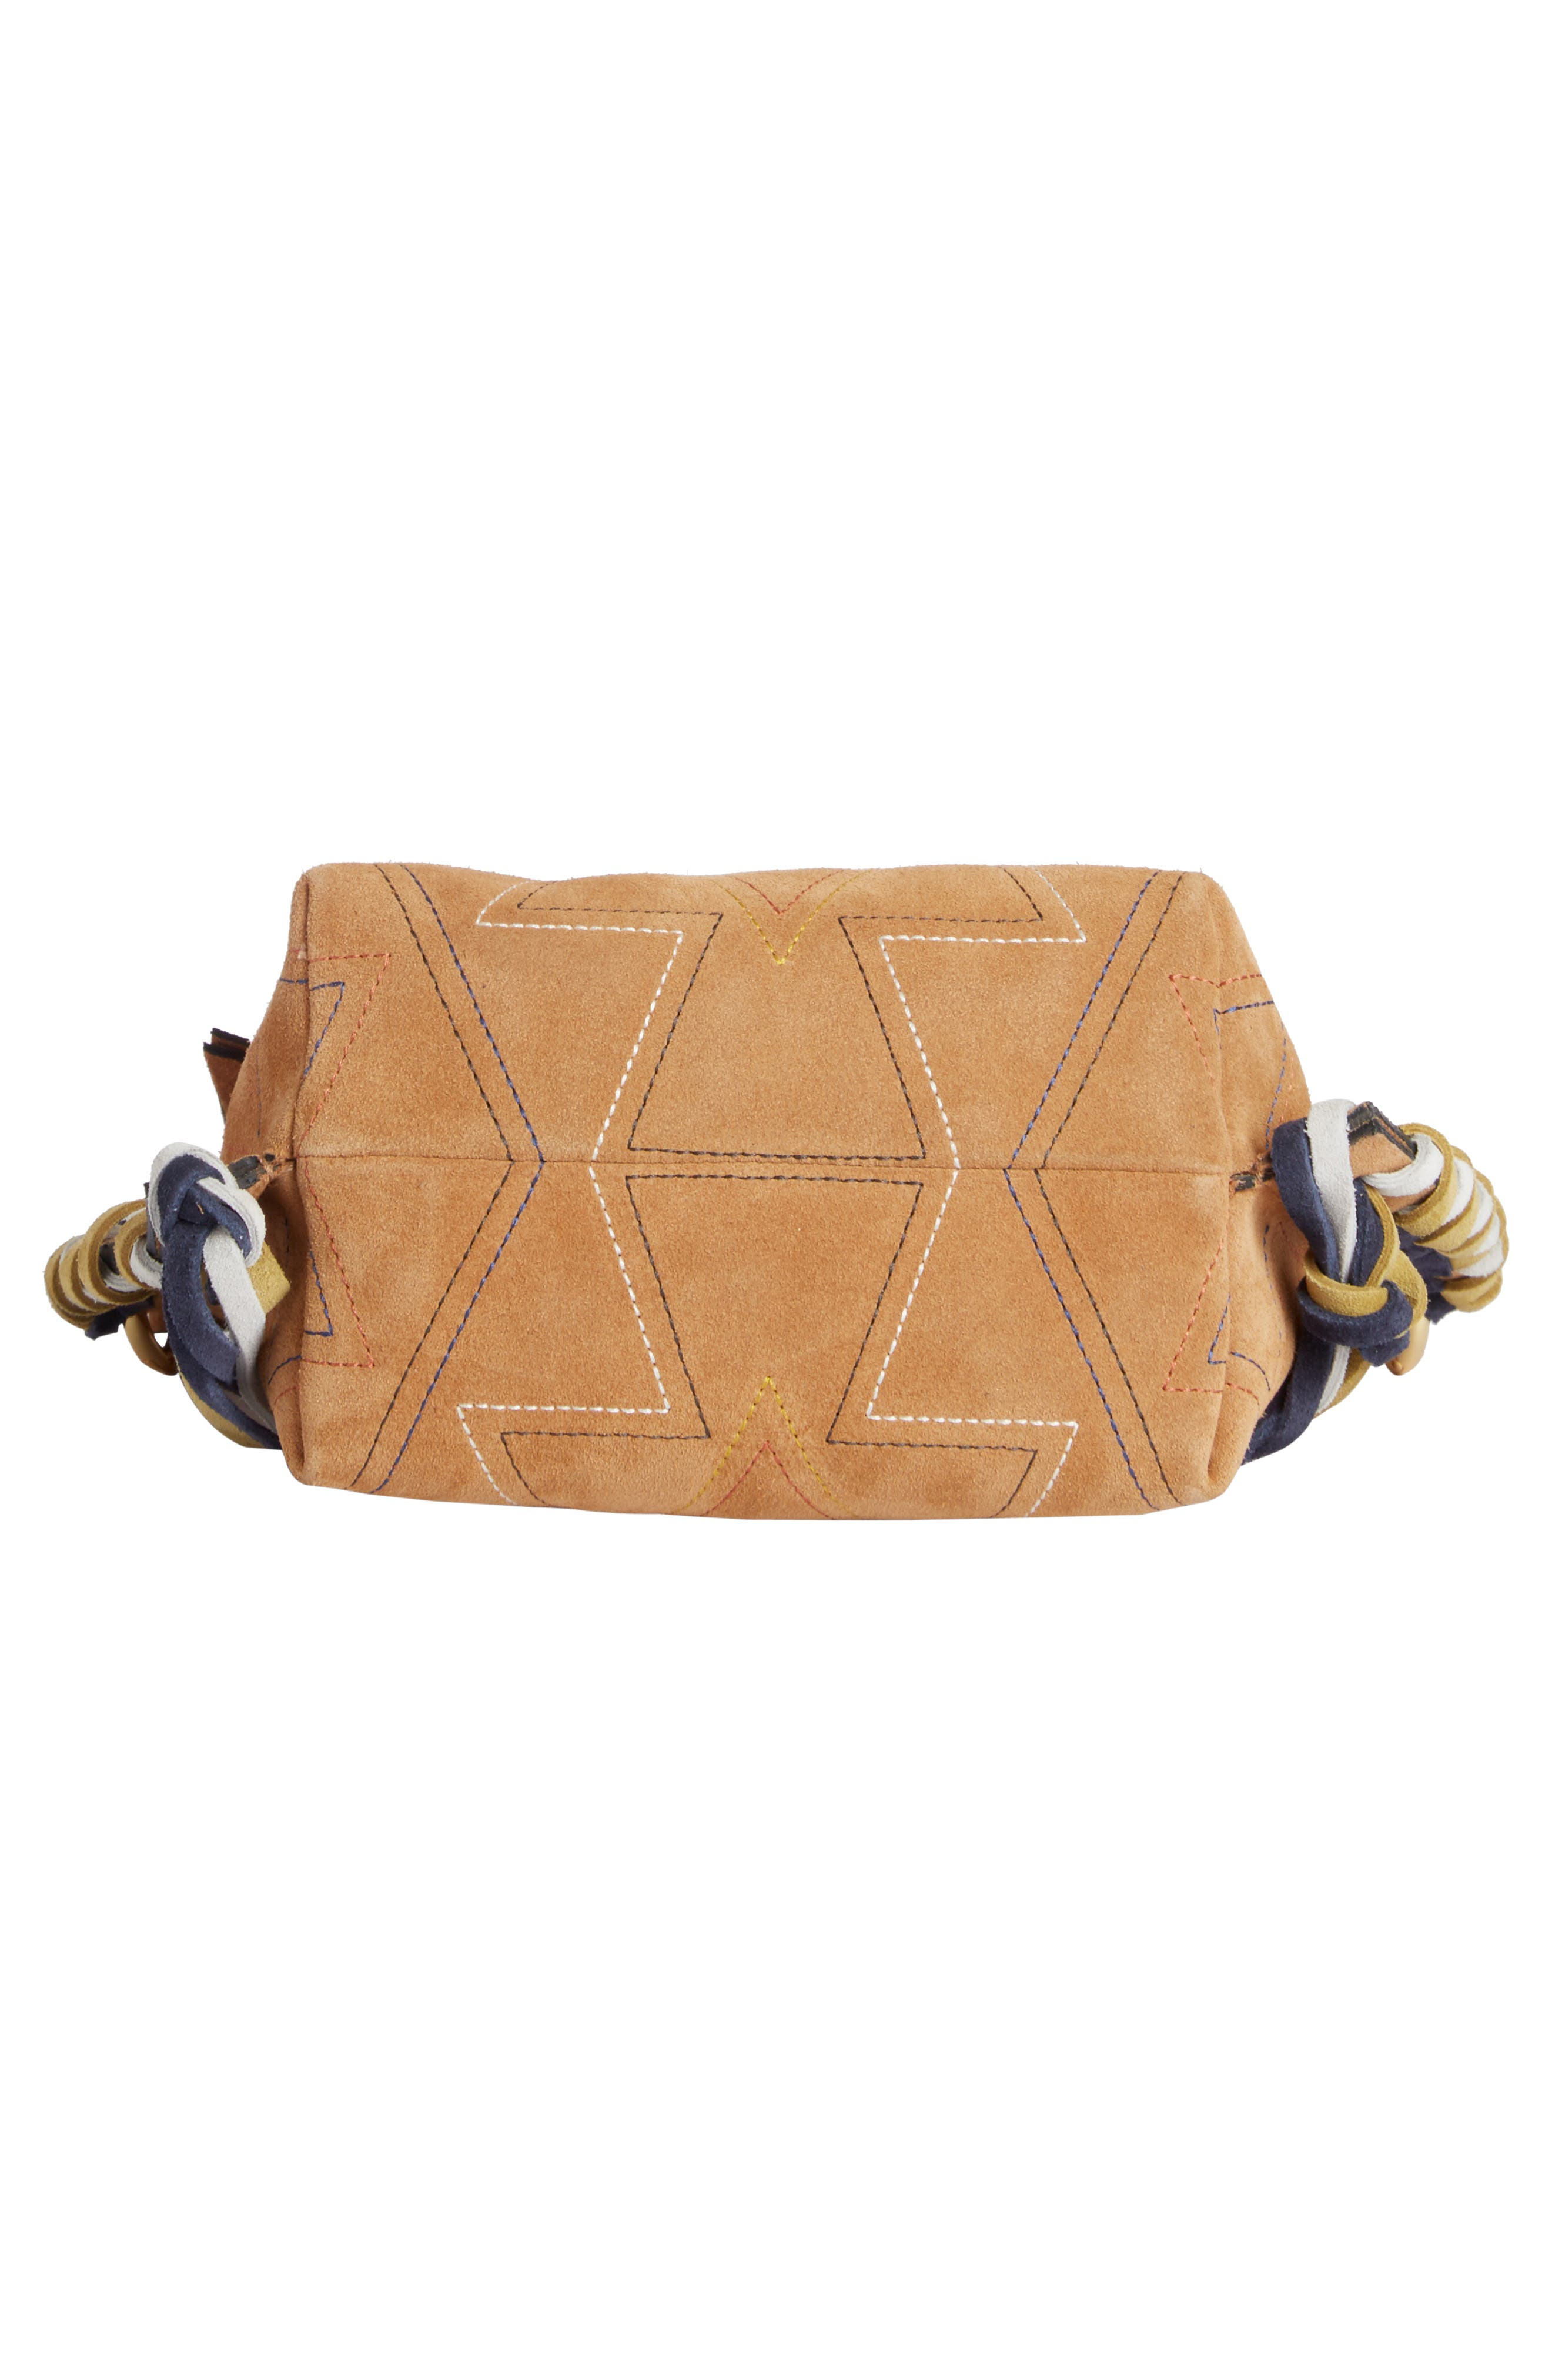 Fangoh Stitched Suede Crossbody Bag,                             Alternate thumbnail 4, color,                             210